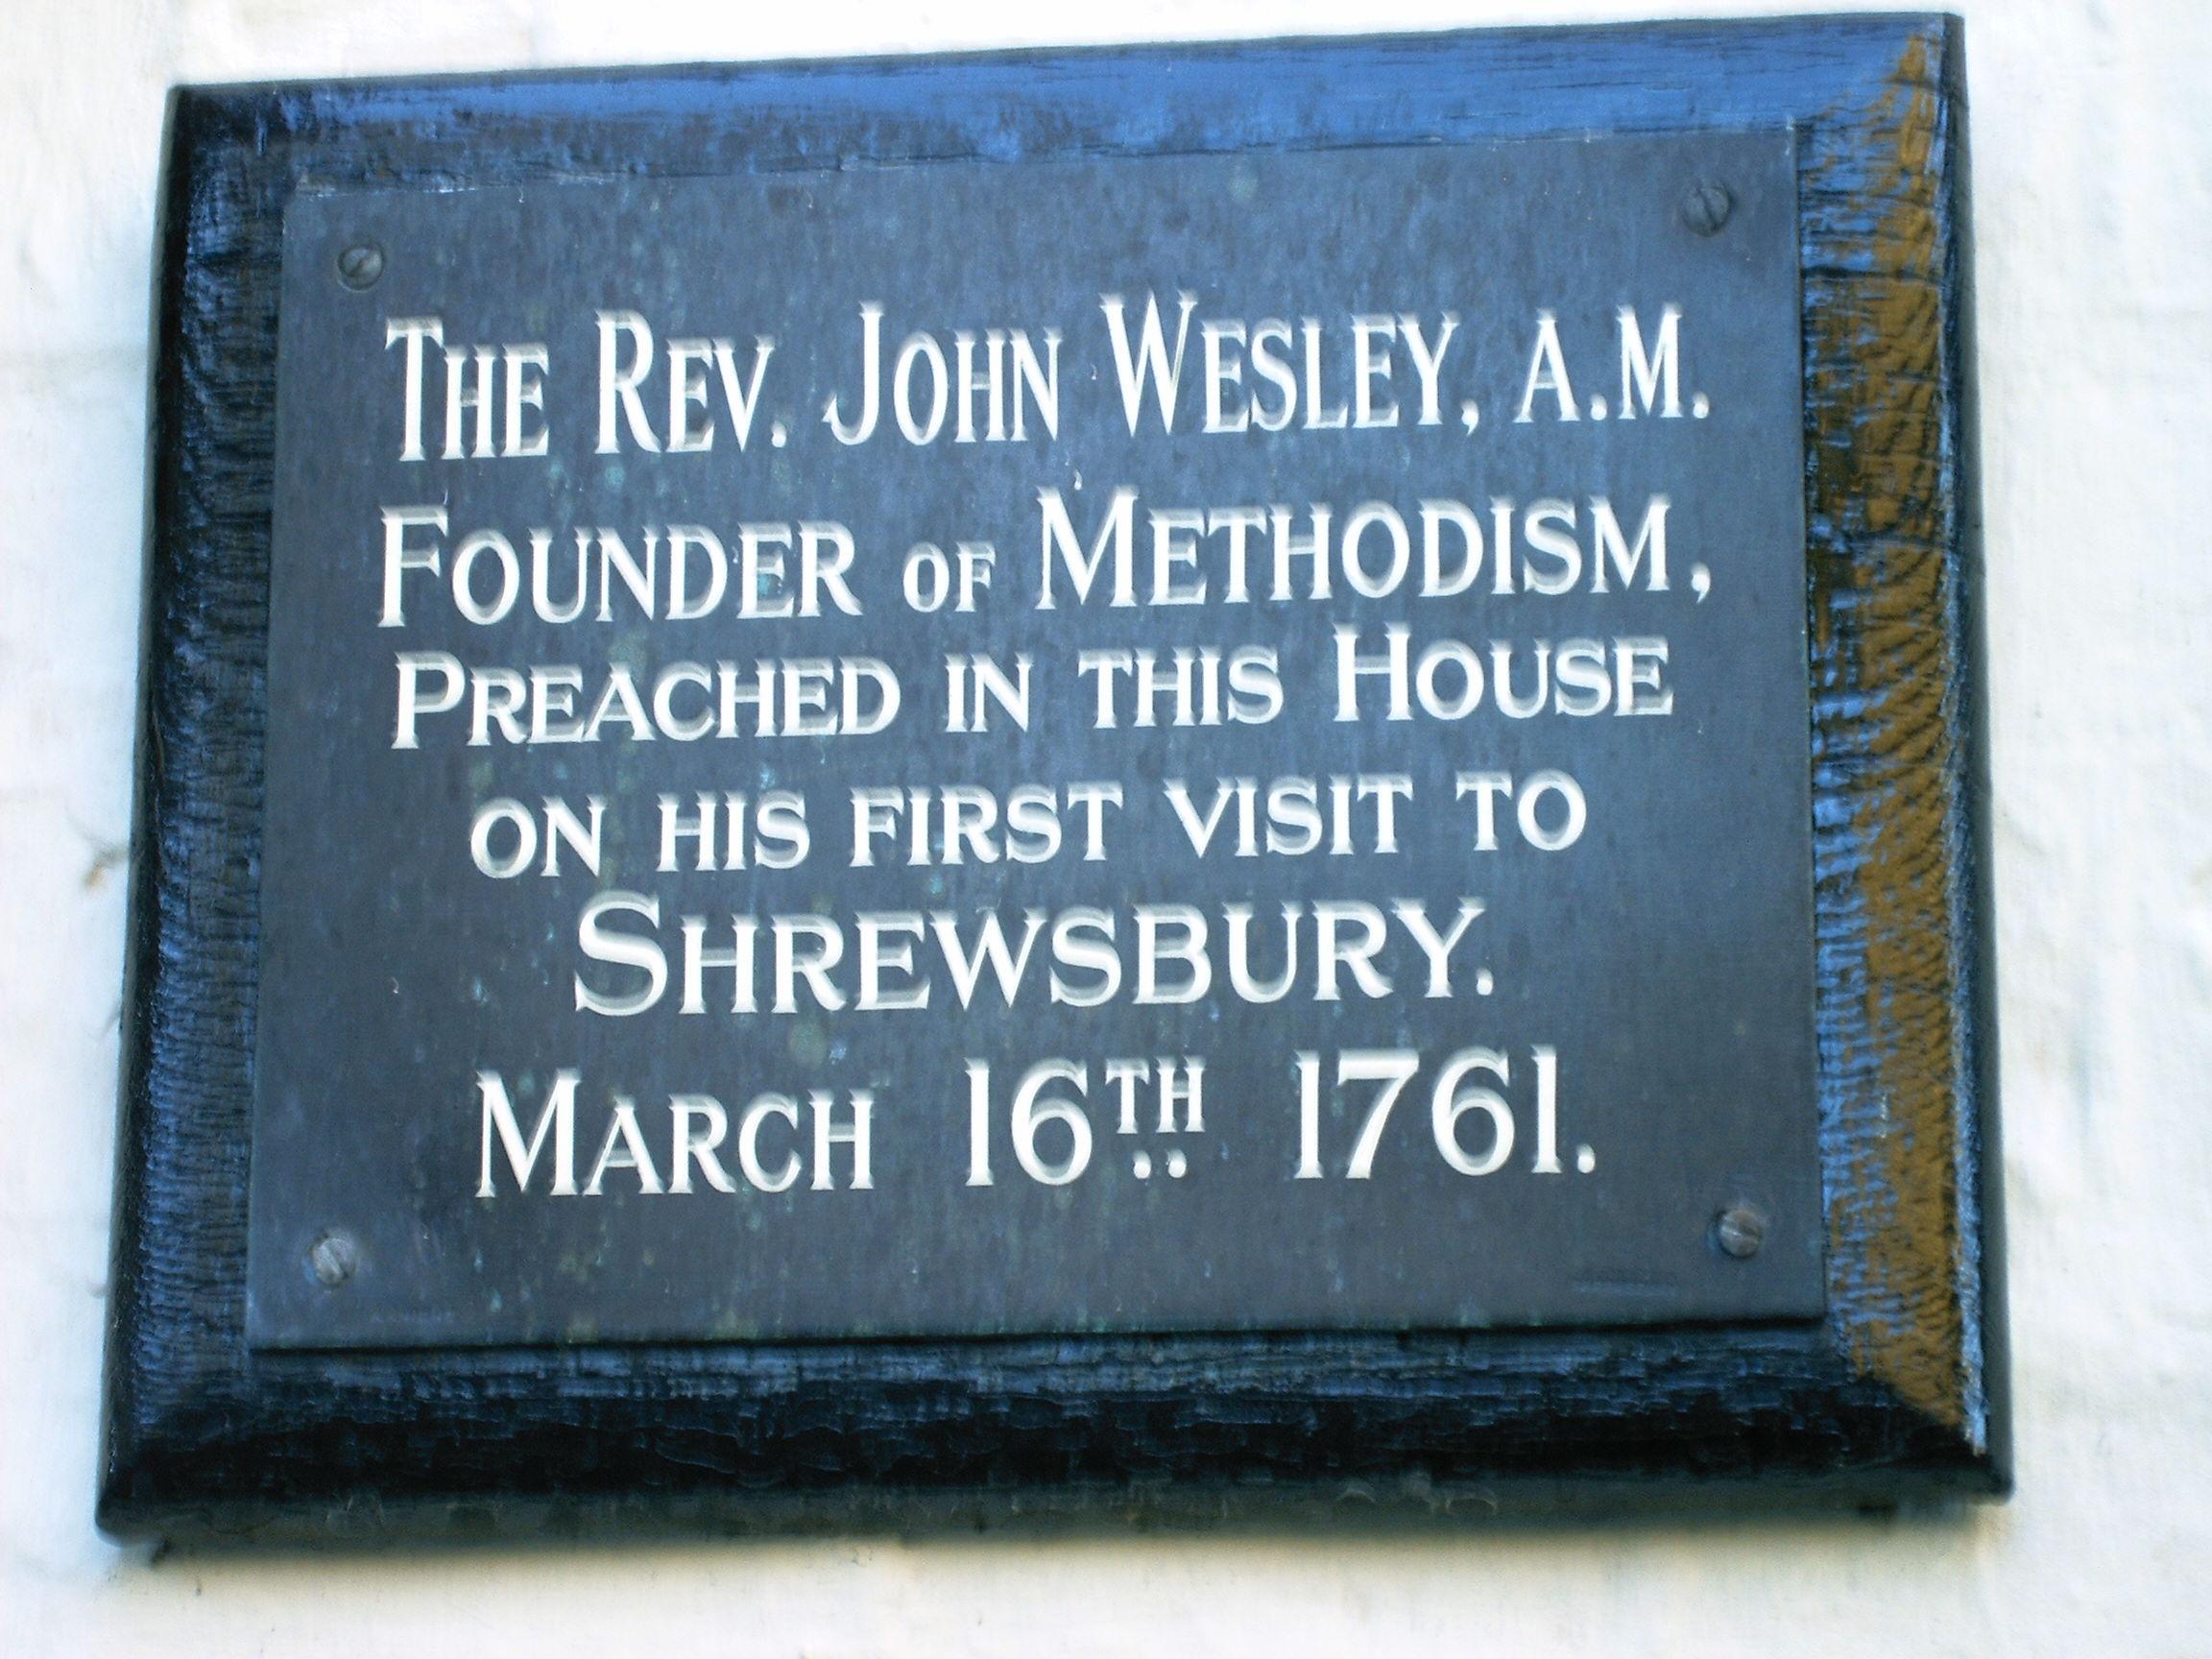 Shrewsbury methodism 01